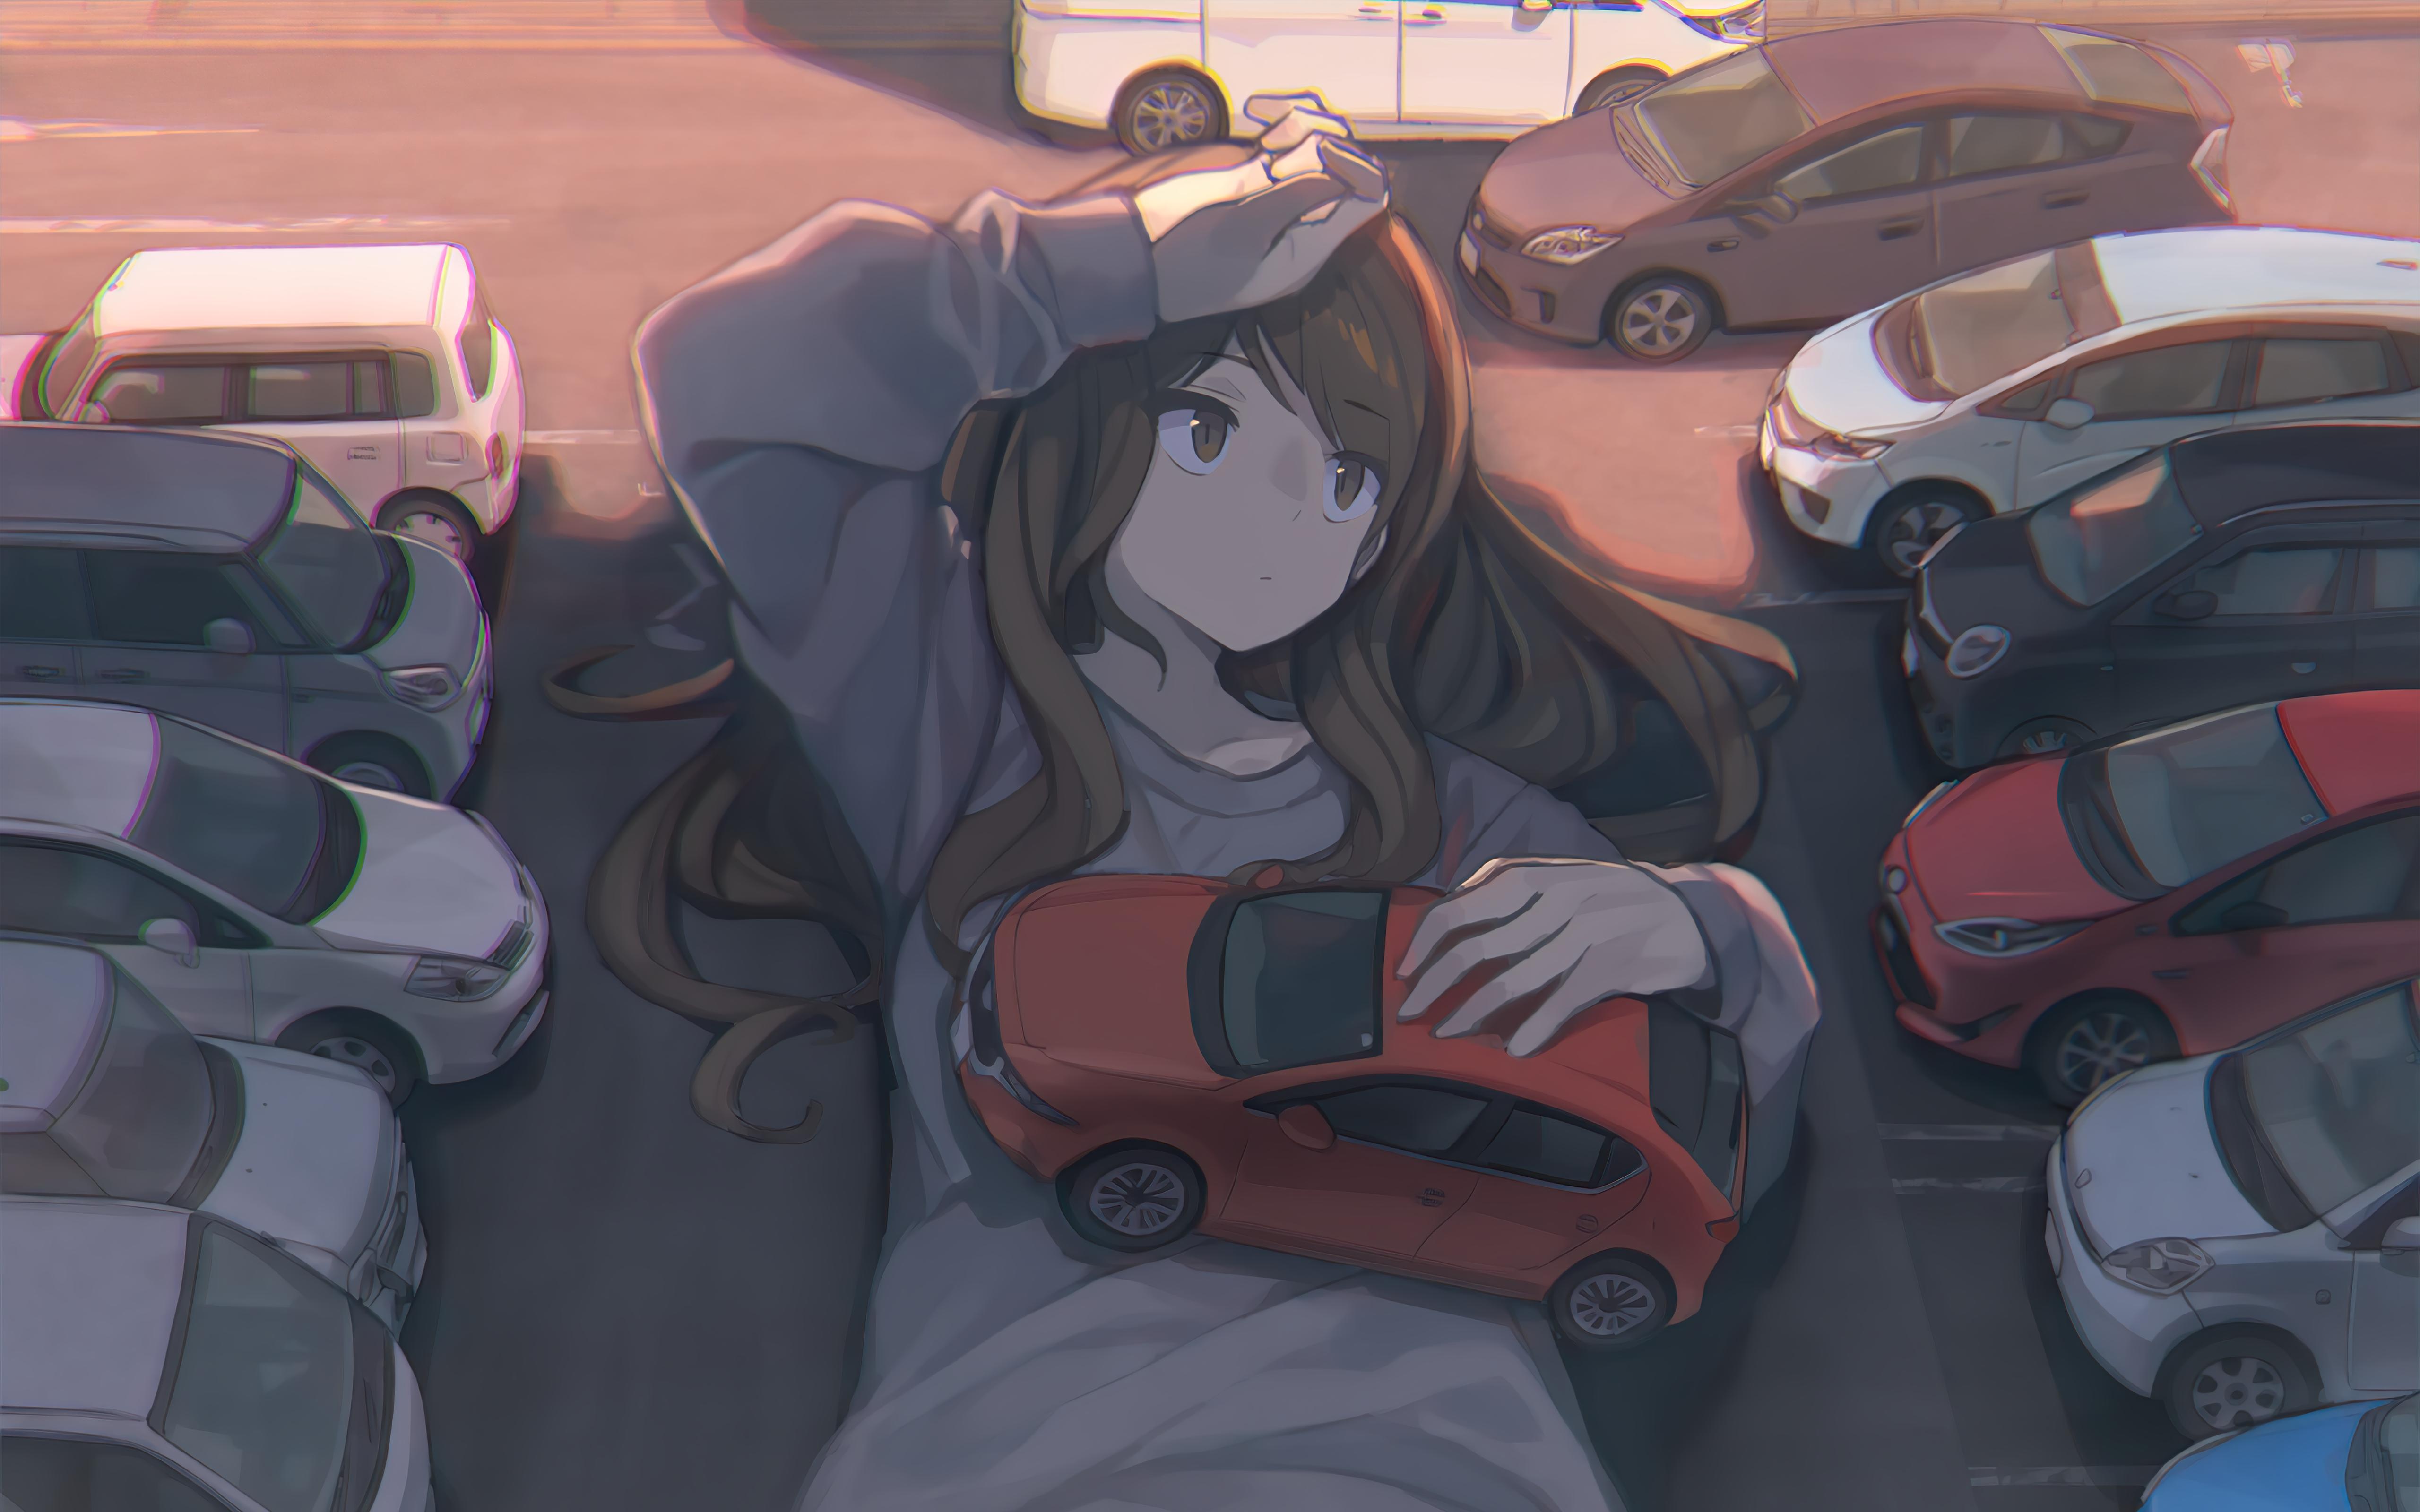 Anime 5120x3200 anime anime girls brunette long hair brown eyes looking away car parking sunlight giantess Tomioka Jirou